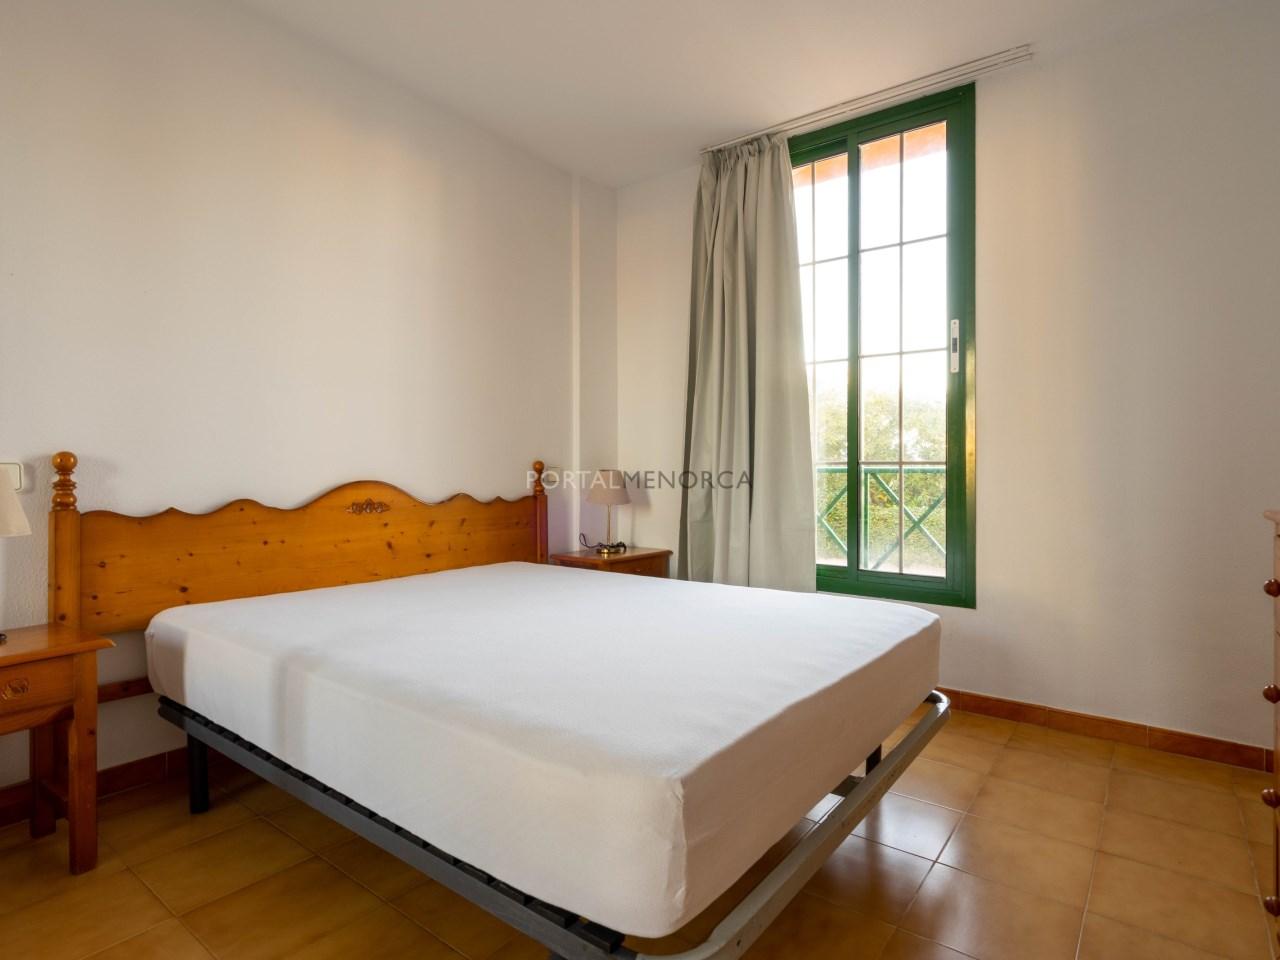 acheter maison es castell menorca (1)